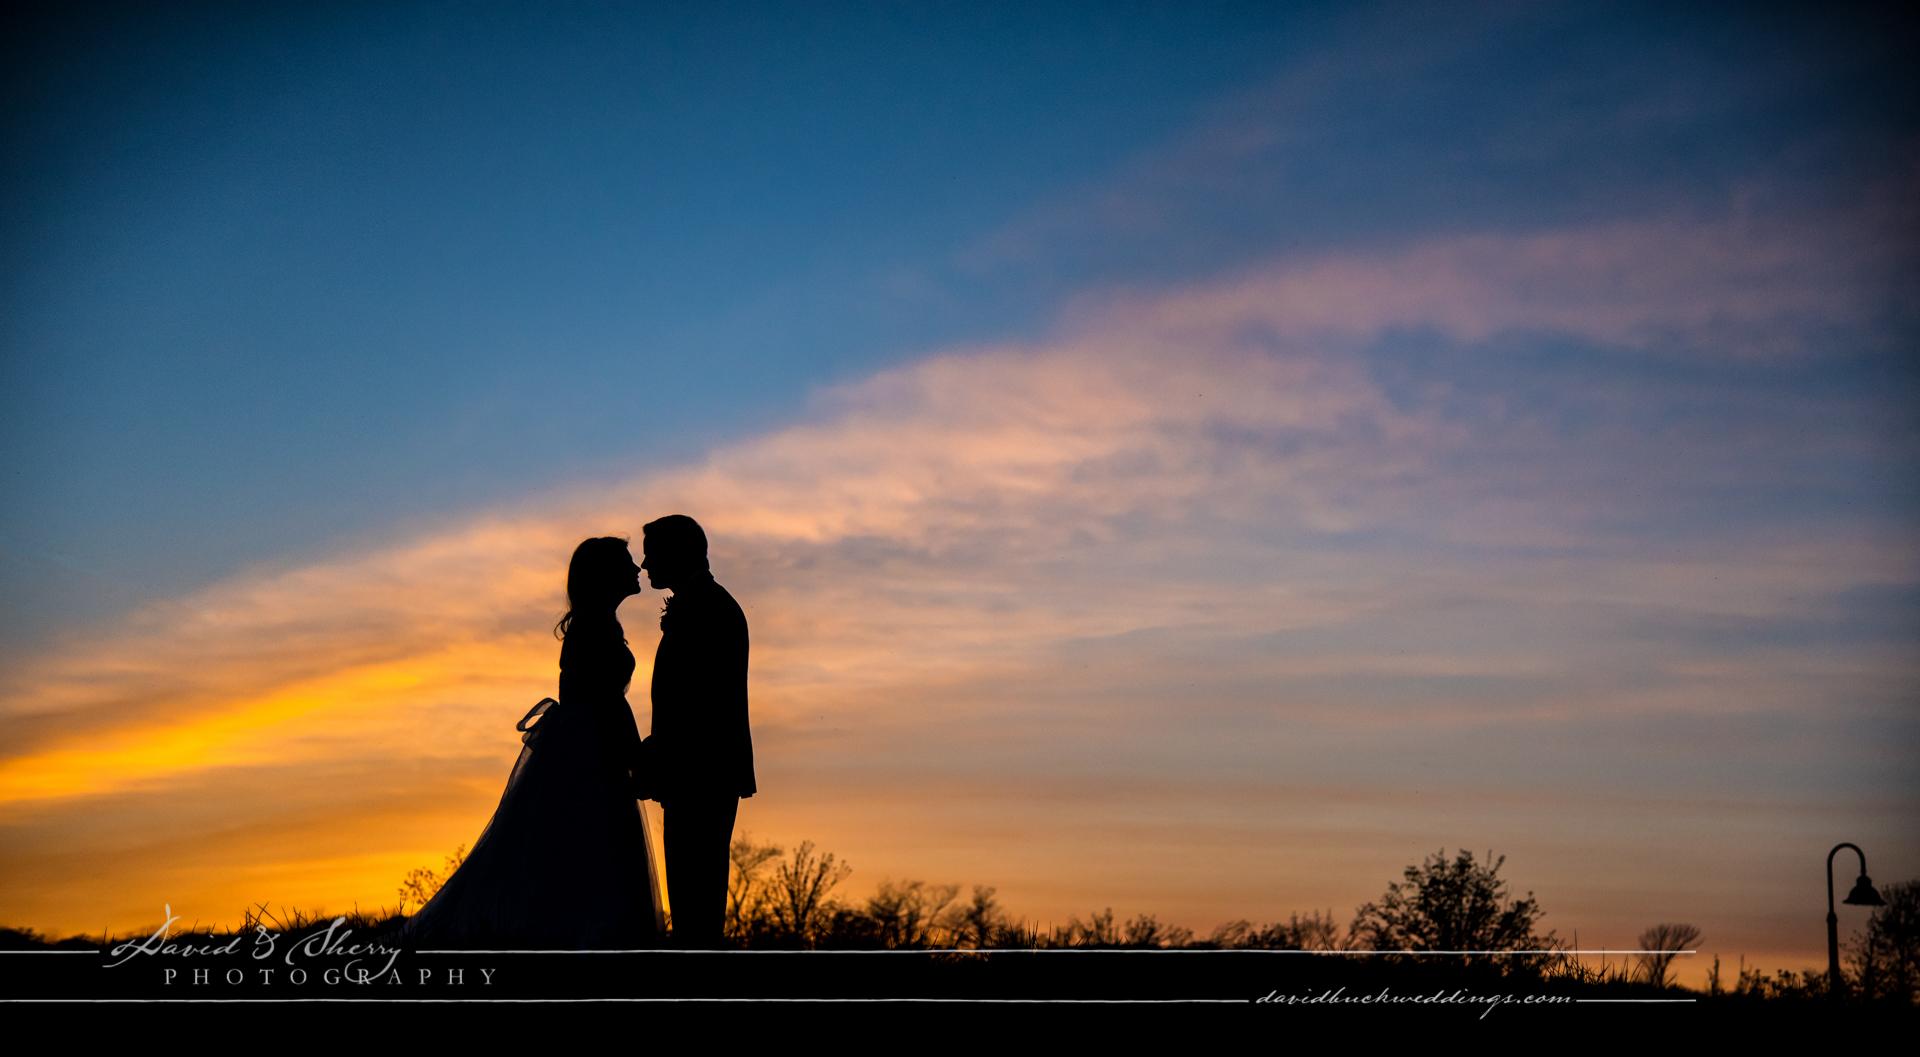 Cobble_Beach_Wedding_Photography_40